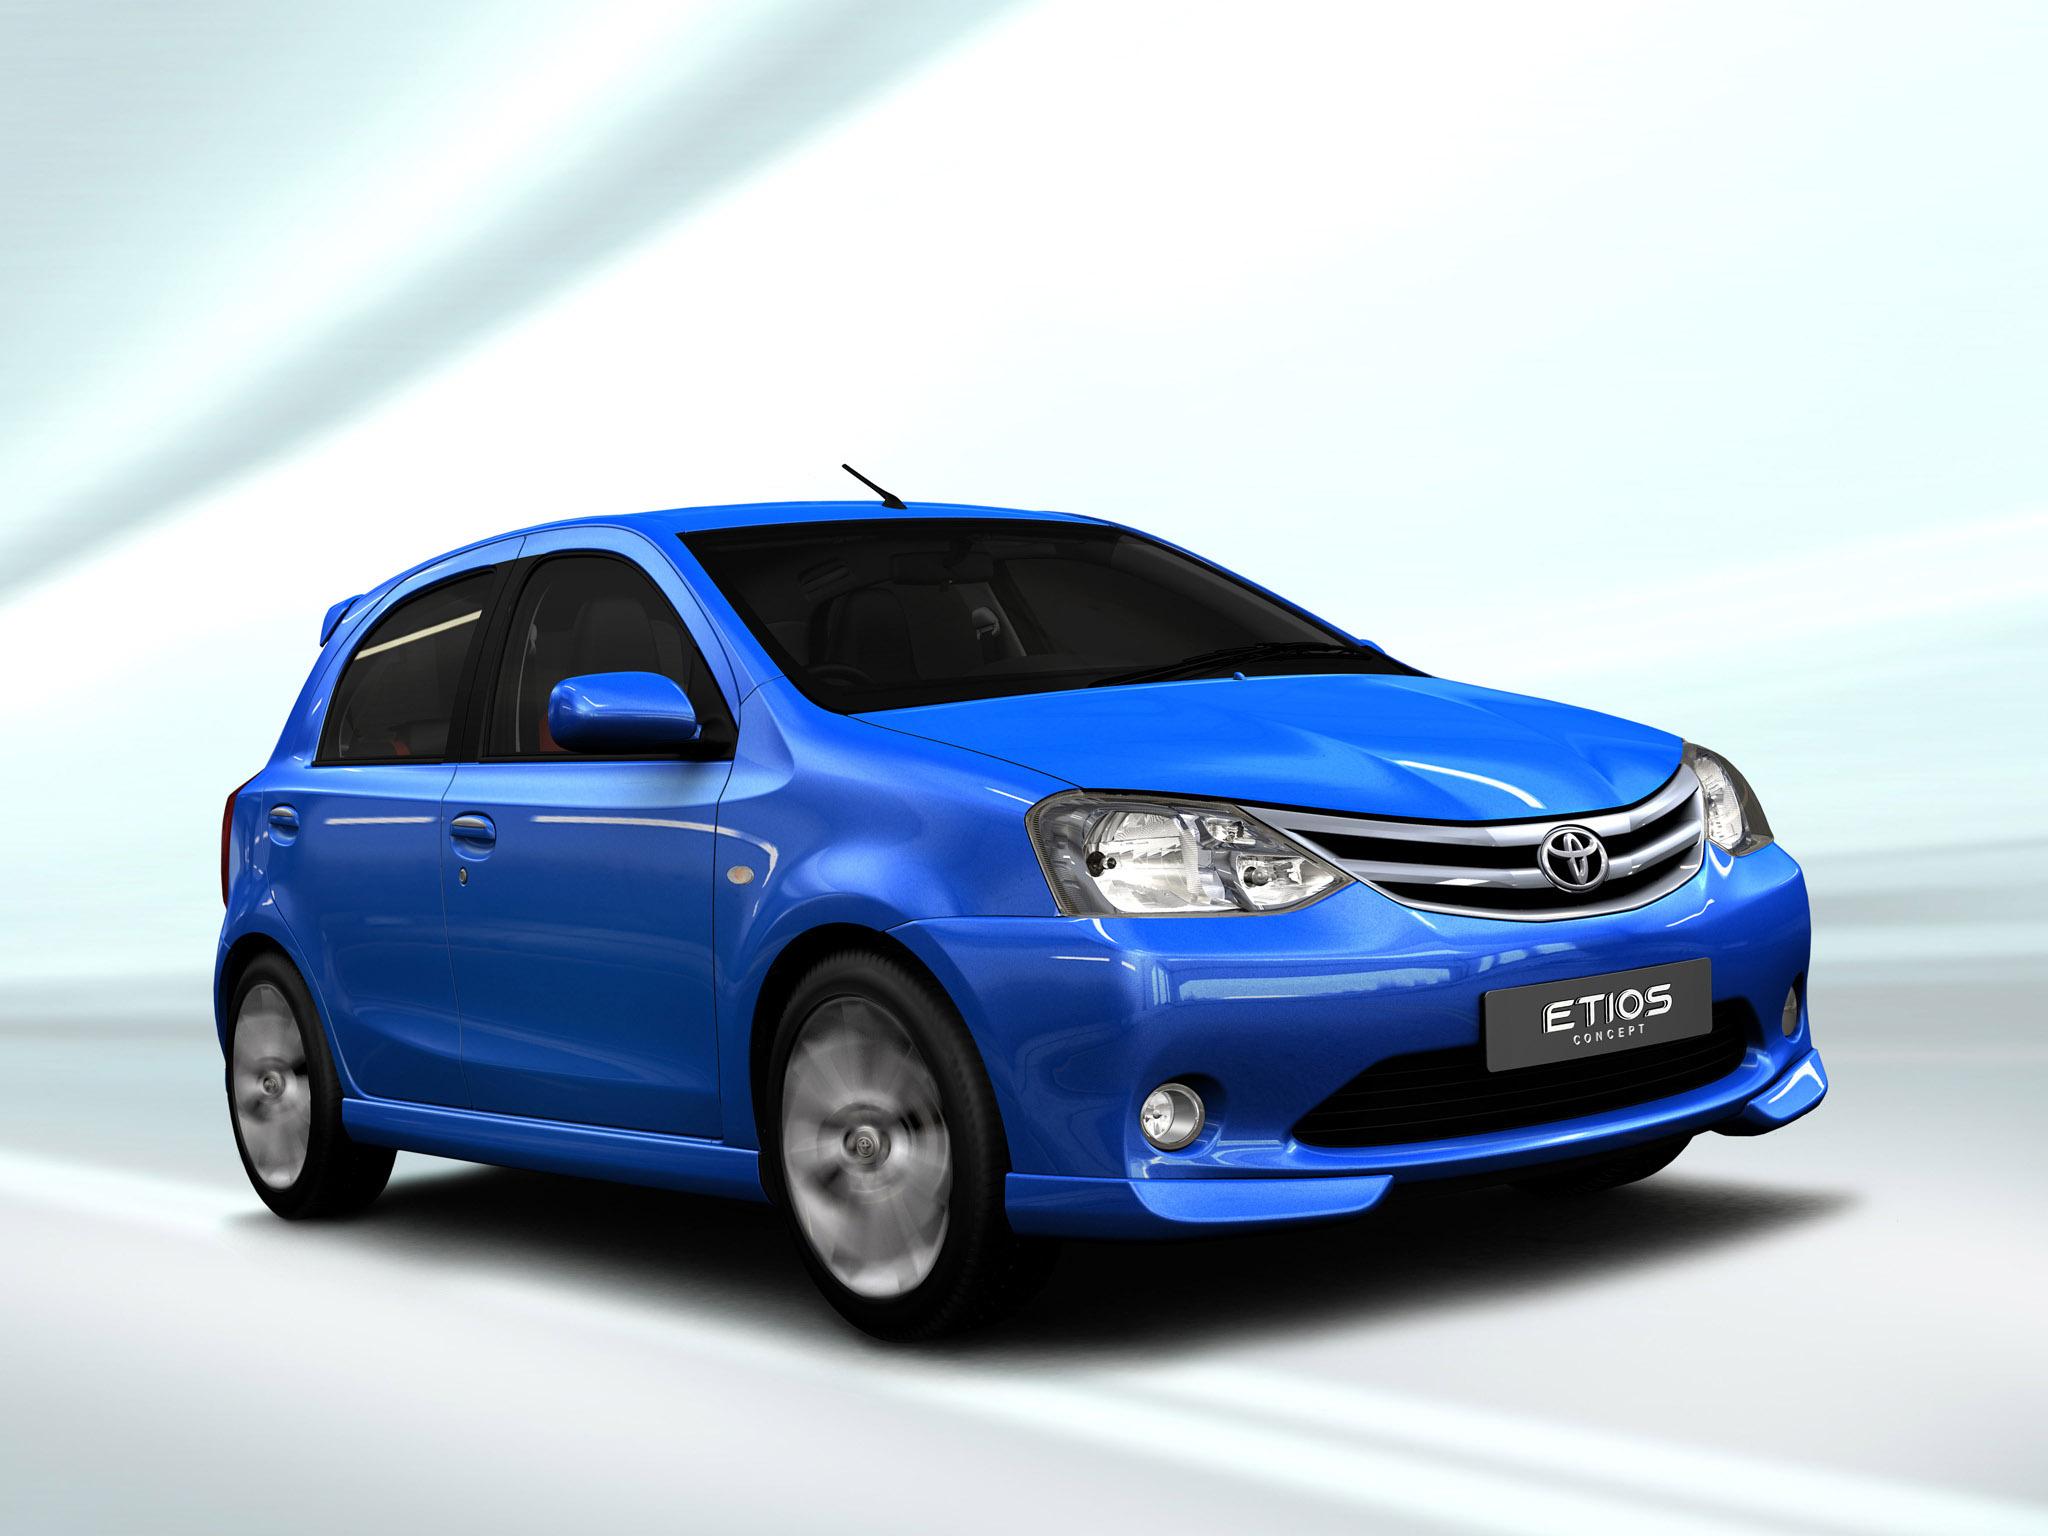 Fastest Growing Car Company